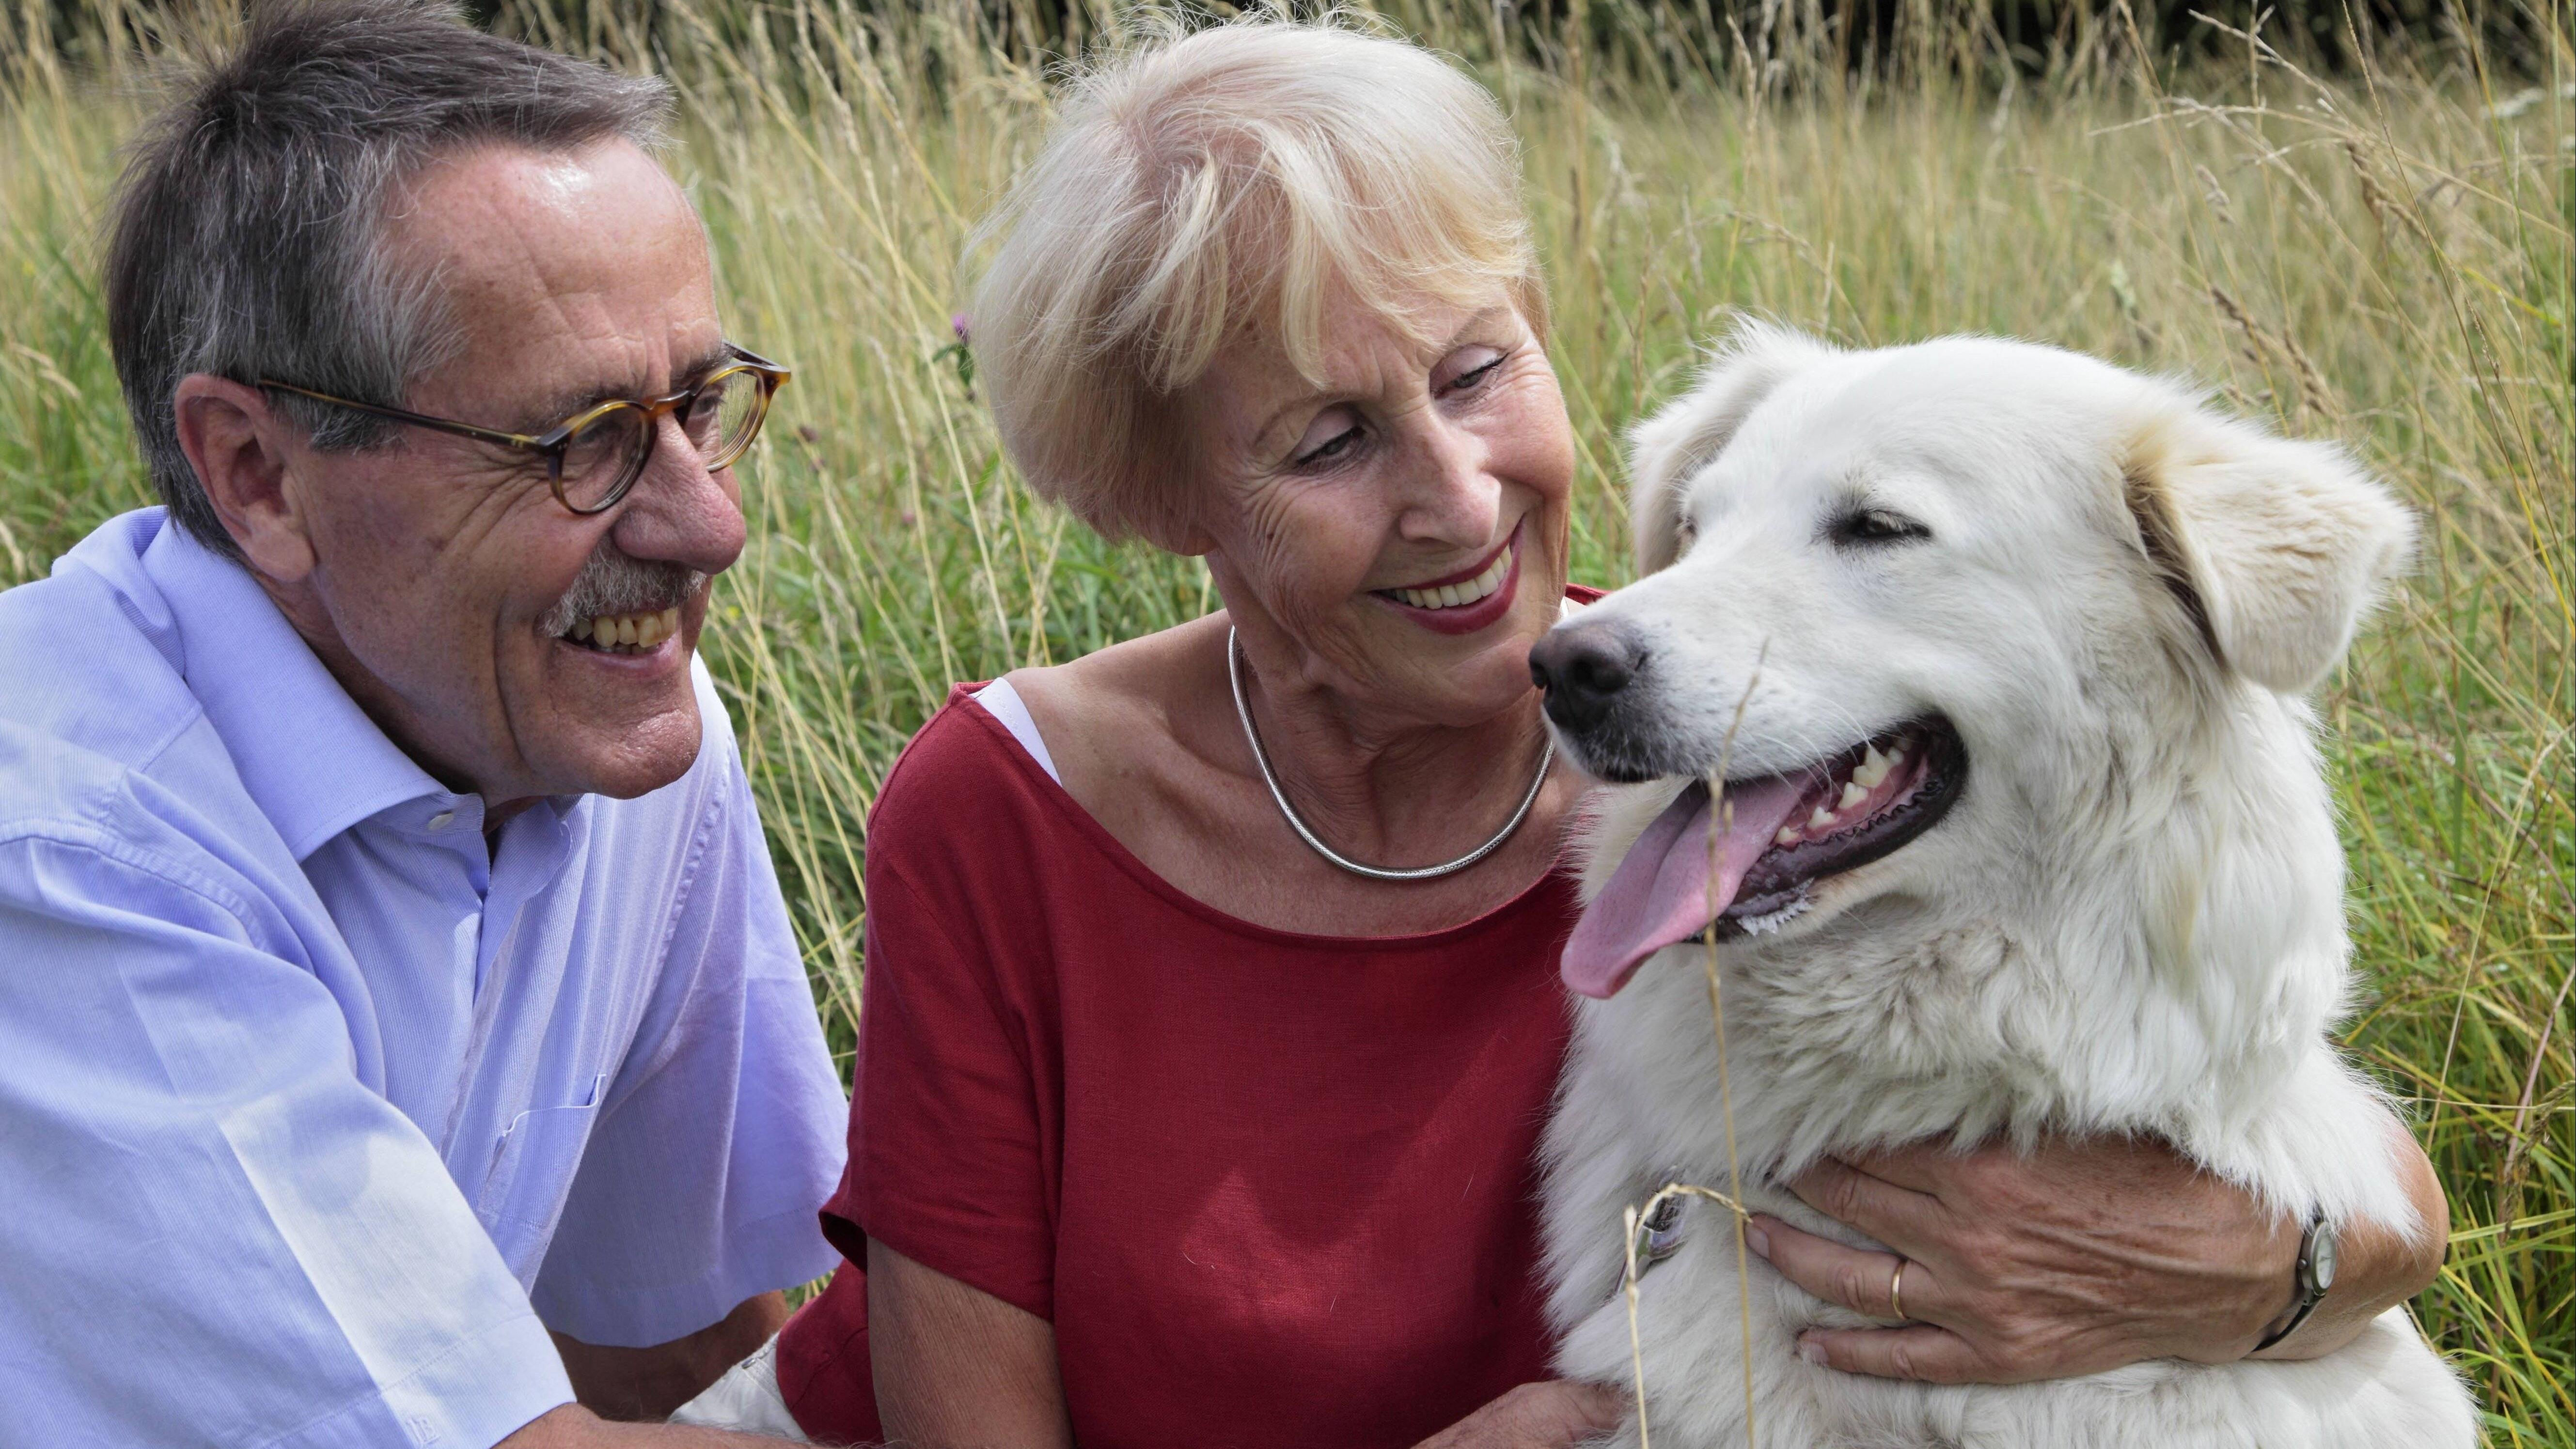 Seniorenpaar mit Hund beim Spaziergang BLWX058443 Copyright: xblickwinkel McPhotox JochenxMüllerx